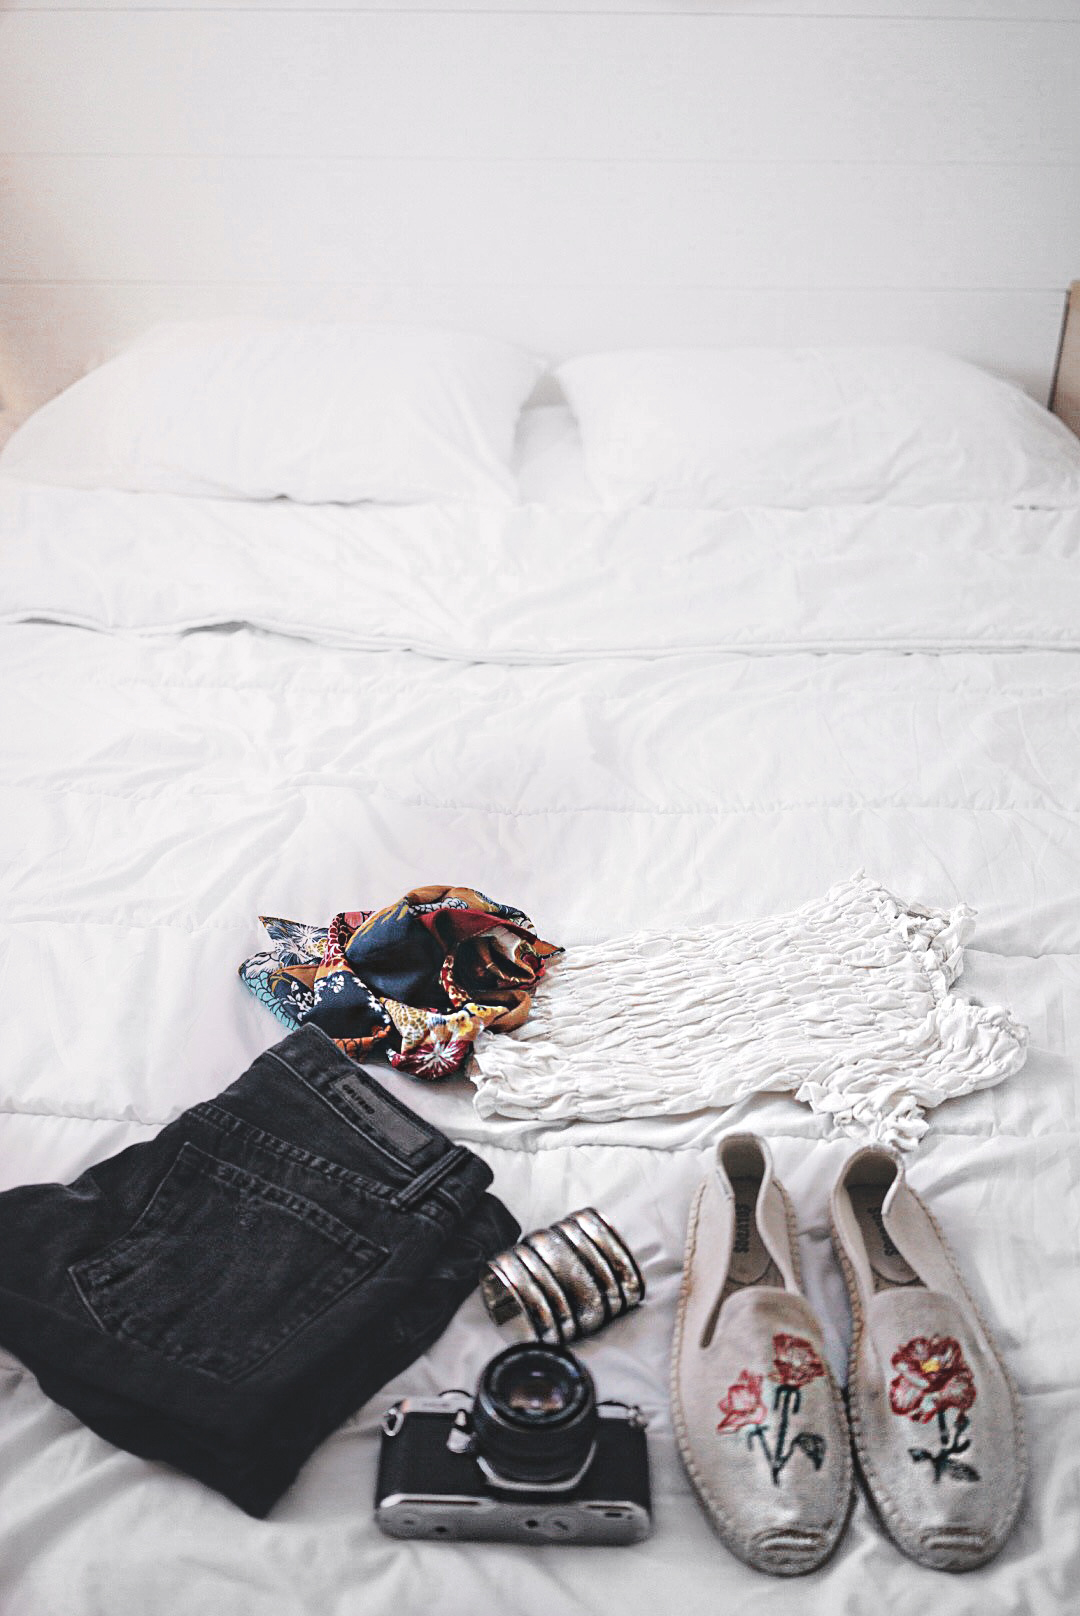 Soludos_Escapes-Boat_Trip-Bikini-Summer_Look-Santorini_Greece-GRLFRND_Jeans-Off_The_Shoulders-Collage_Vintage-Street_Style-Soludos_Espadrilles-41